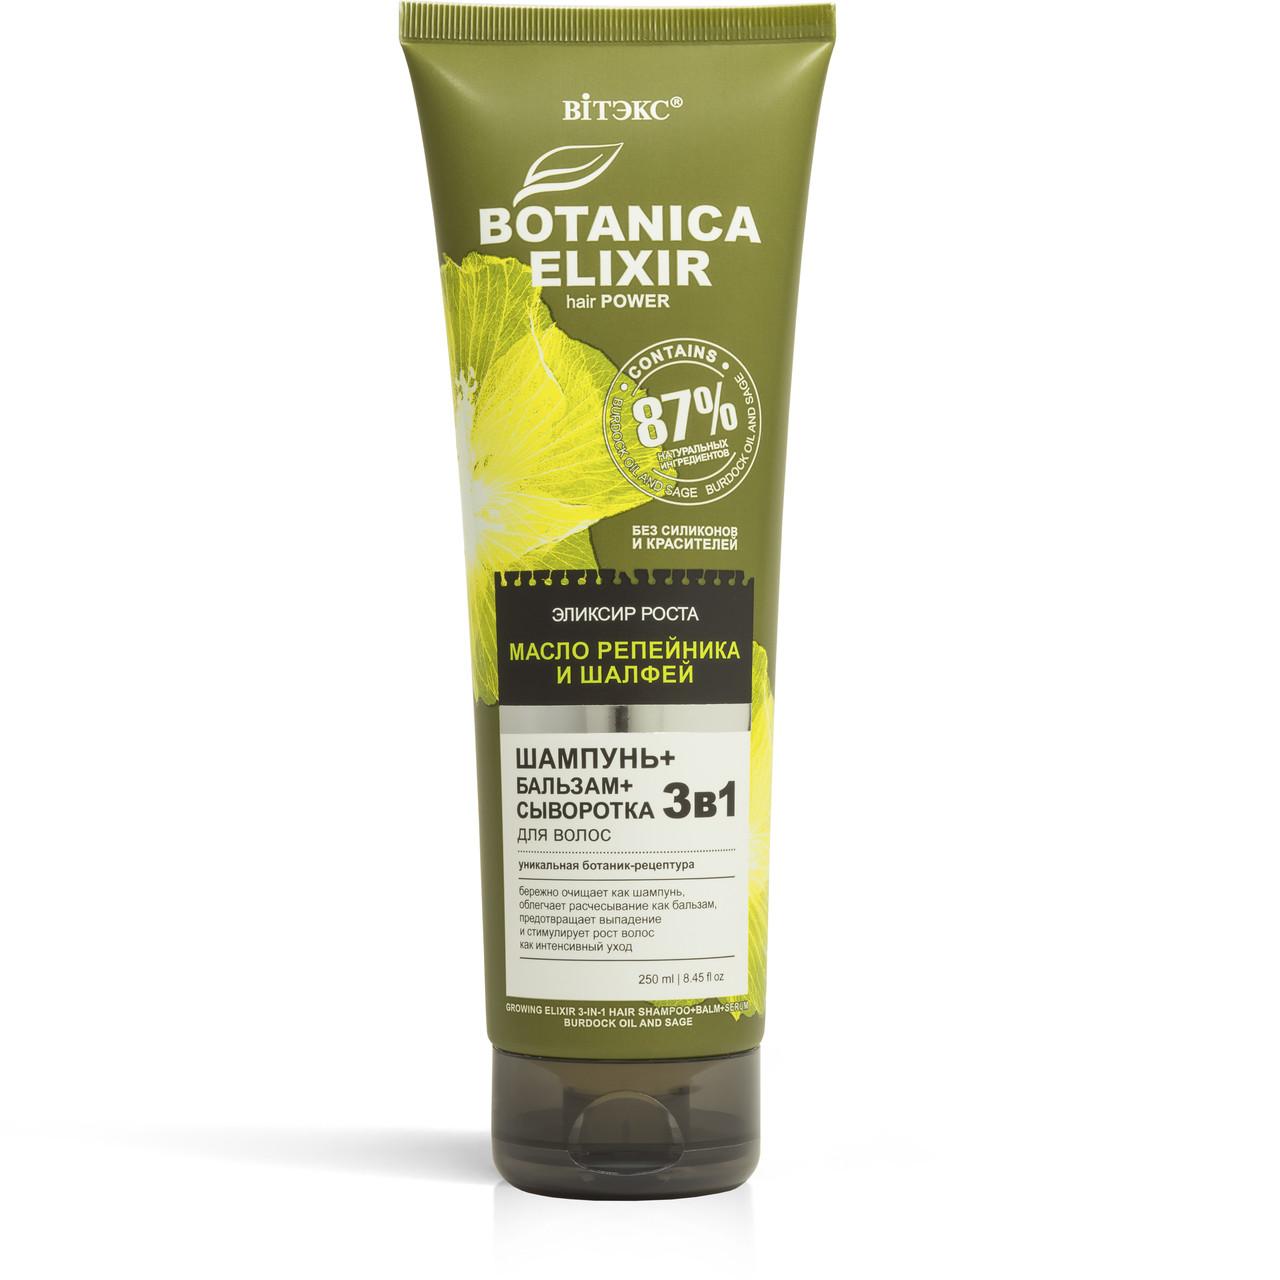 Еліксир зростання 3 в 1 ШАМПУНЬ + БАЛЬЗАМ + СИРОВАТКА для волосся Вітекс Botanica Elixir 250 мл